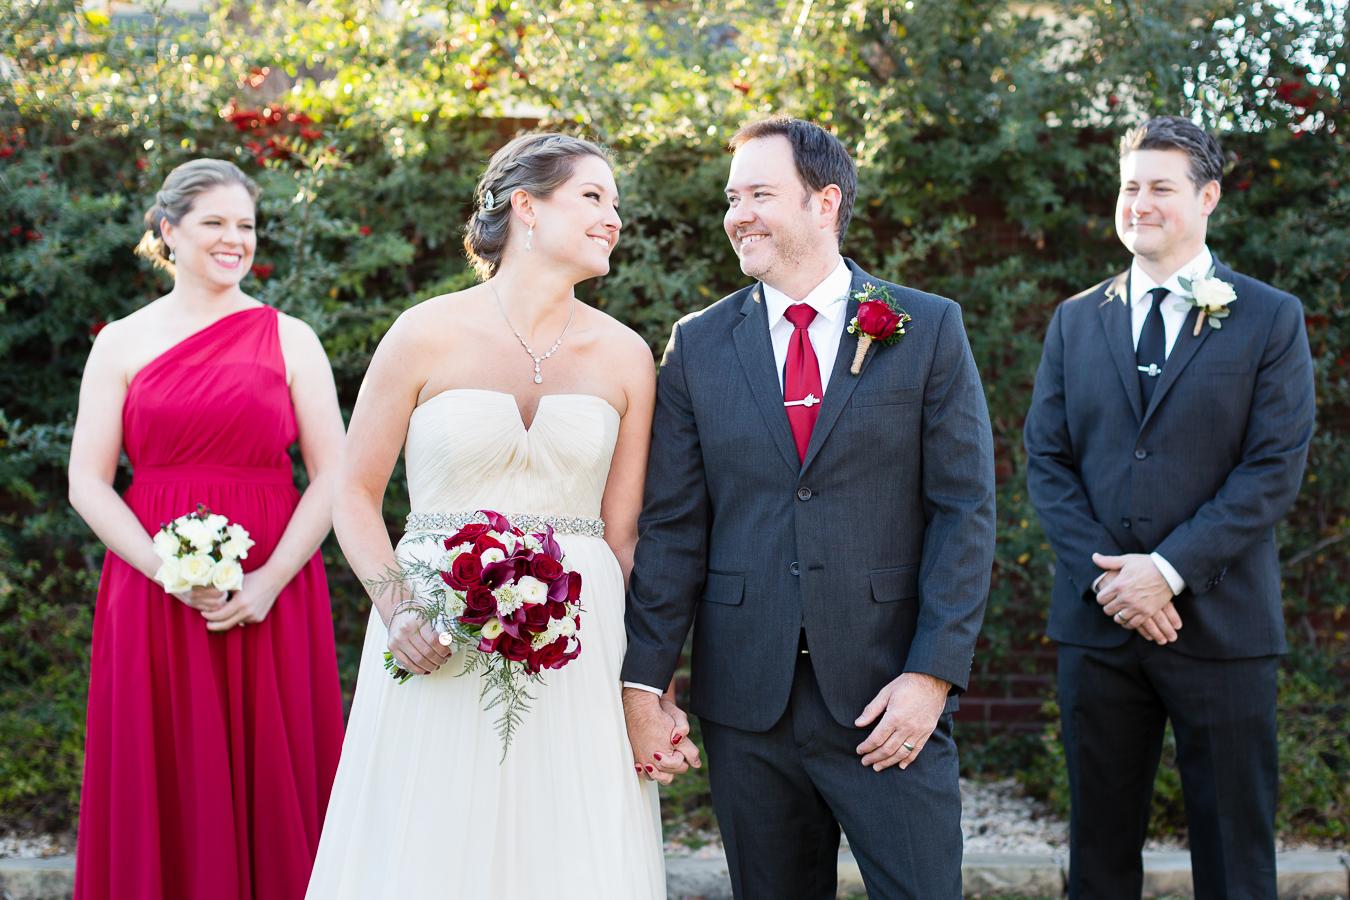 union-on-eighth-wedding-photographs-009.jpg